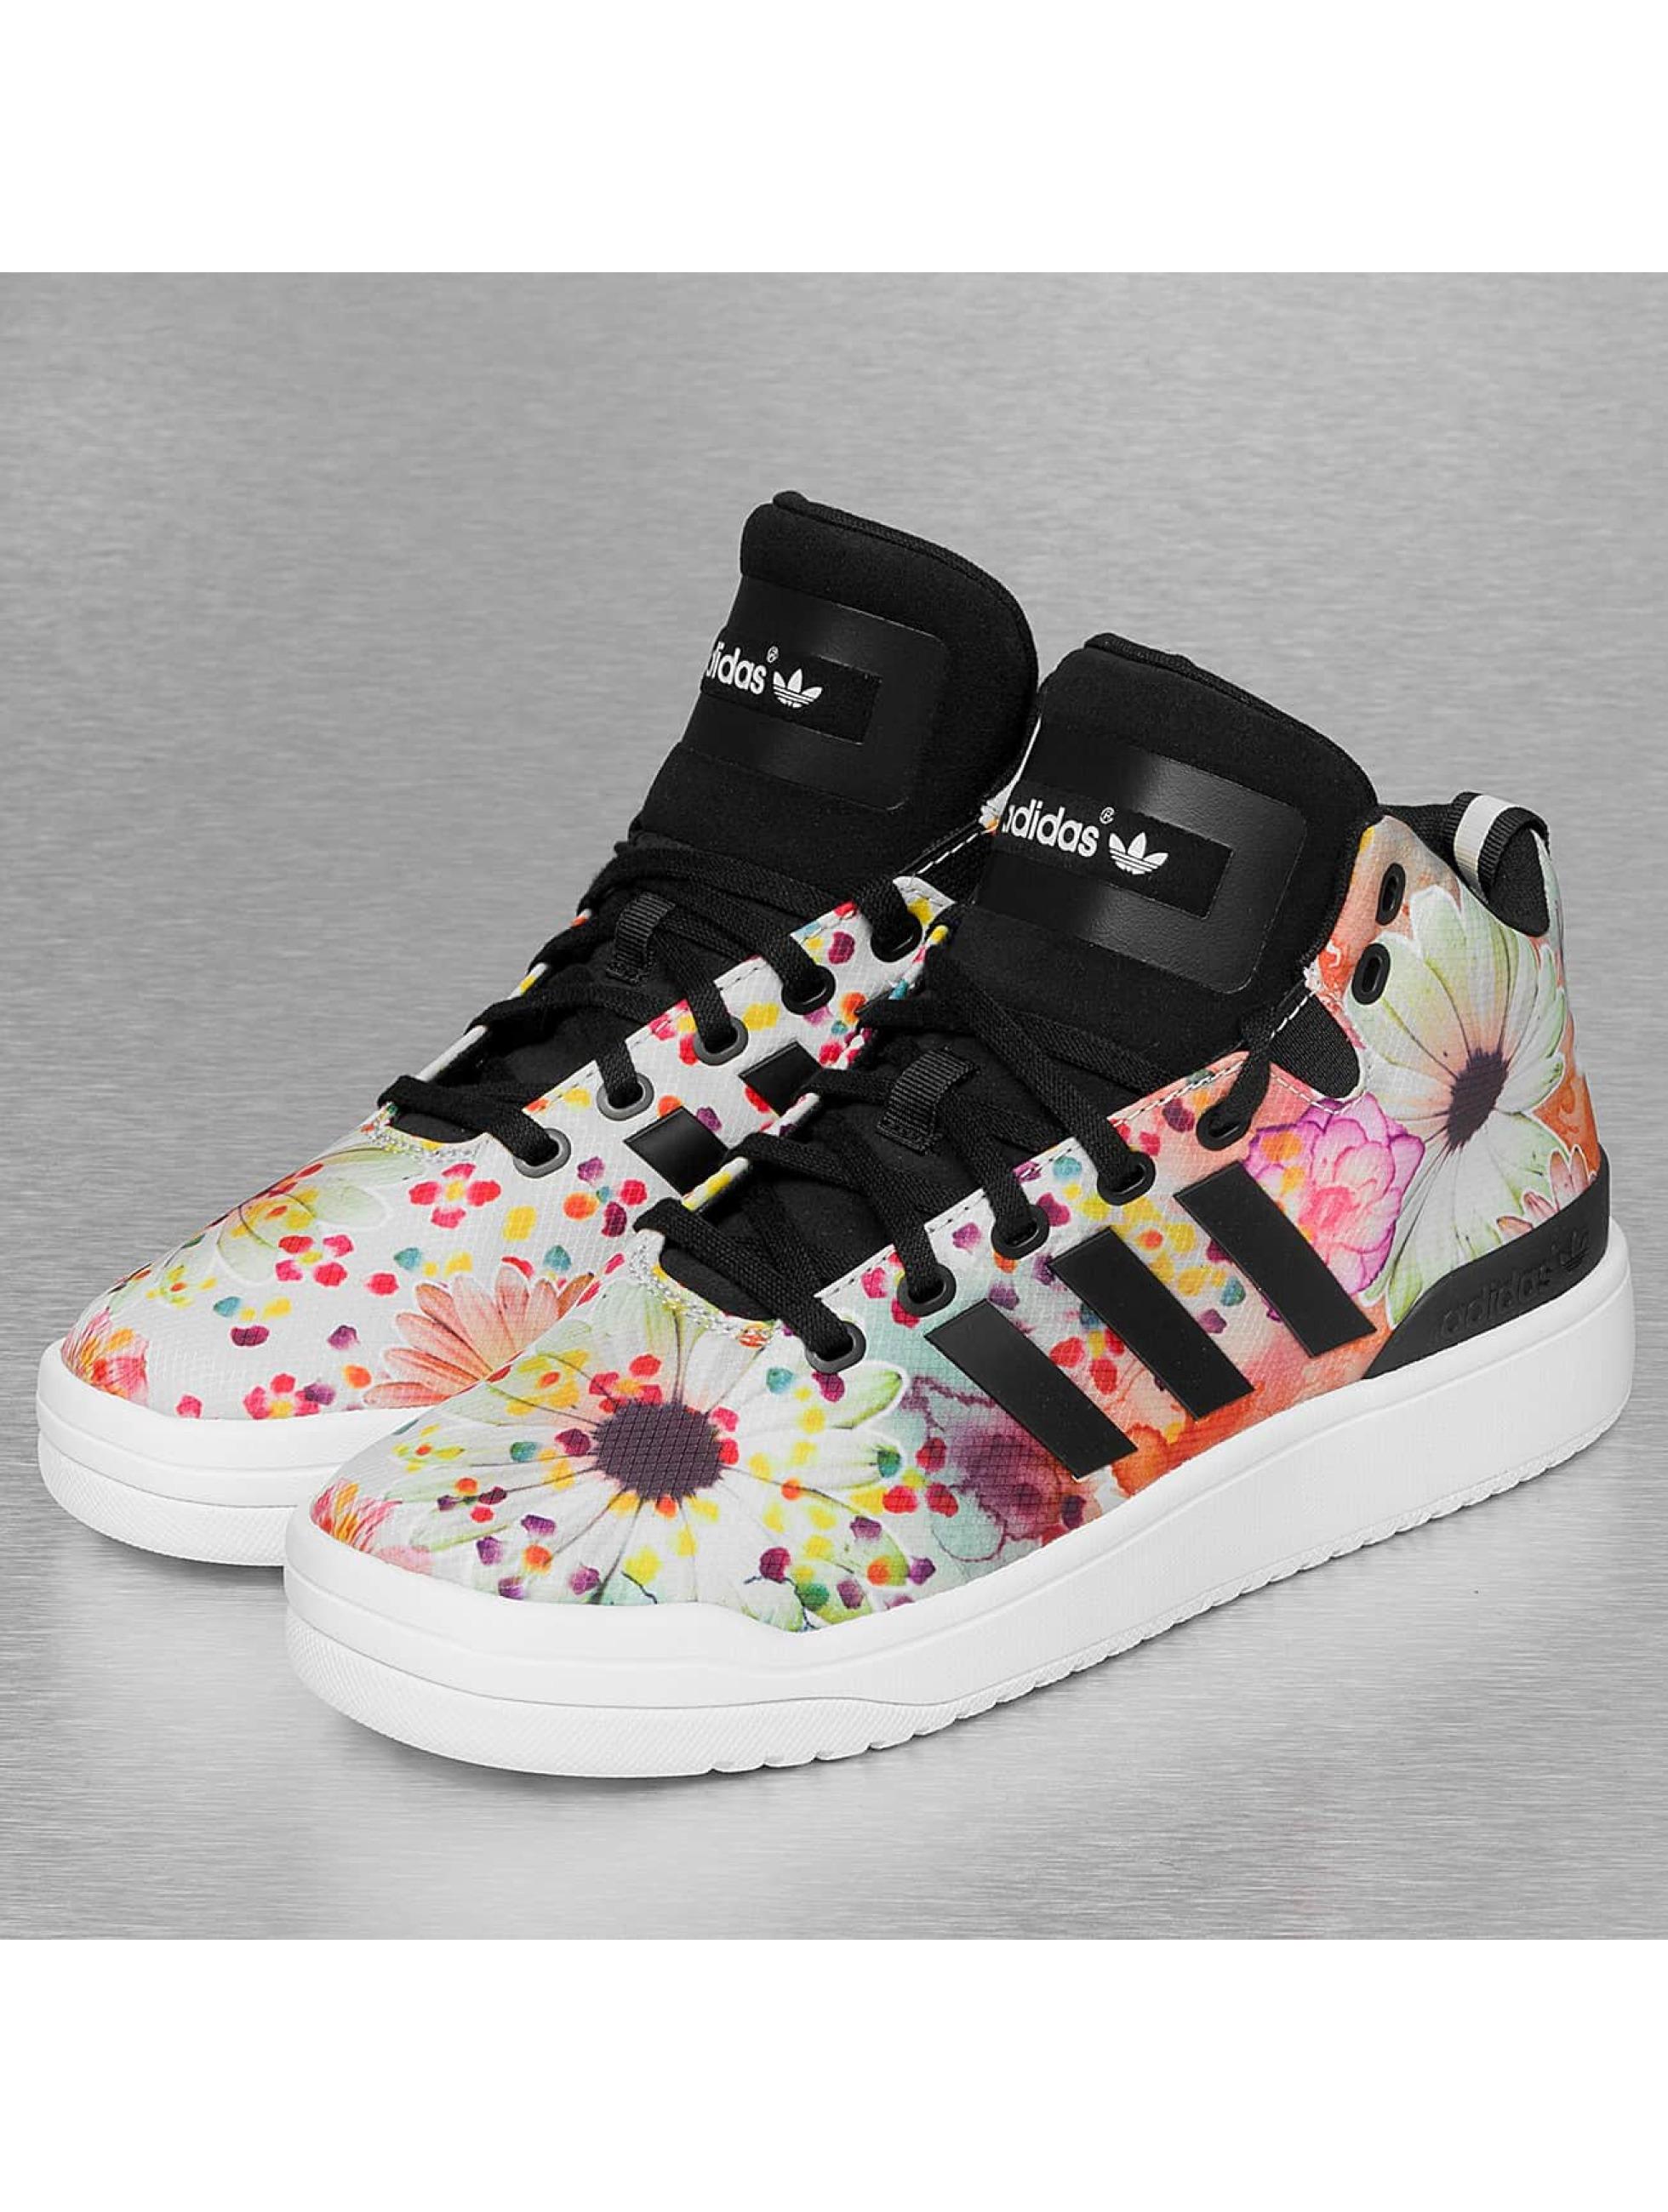 Adidas Sportschuhe Damen Bunt